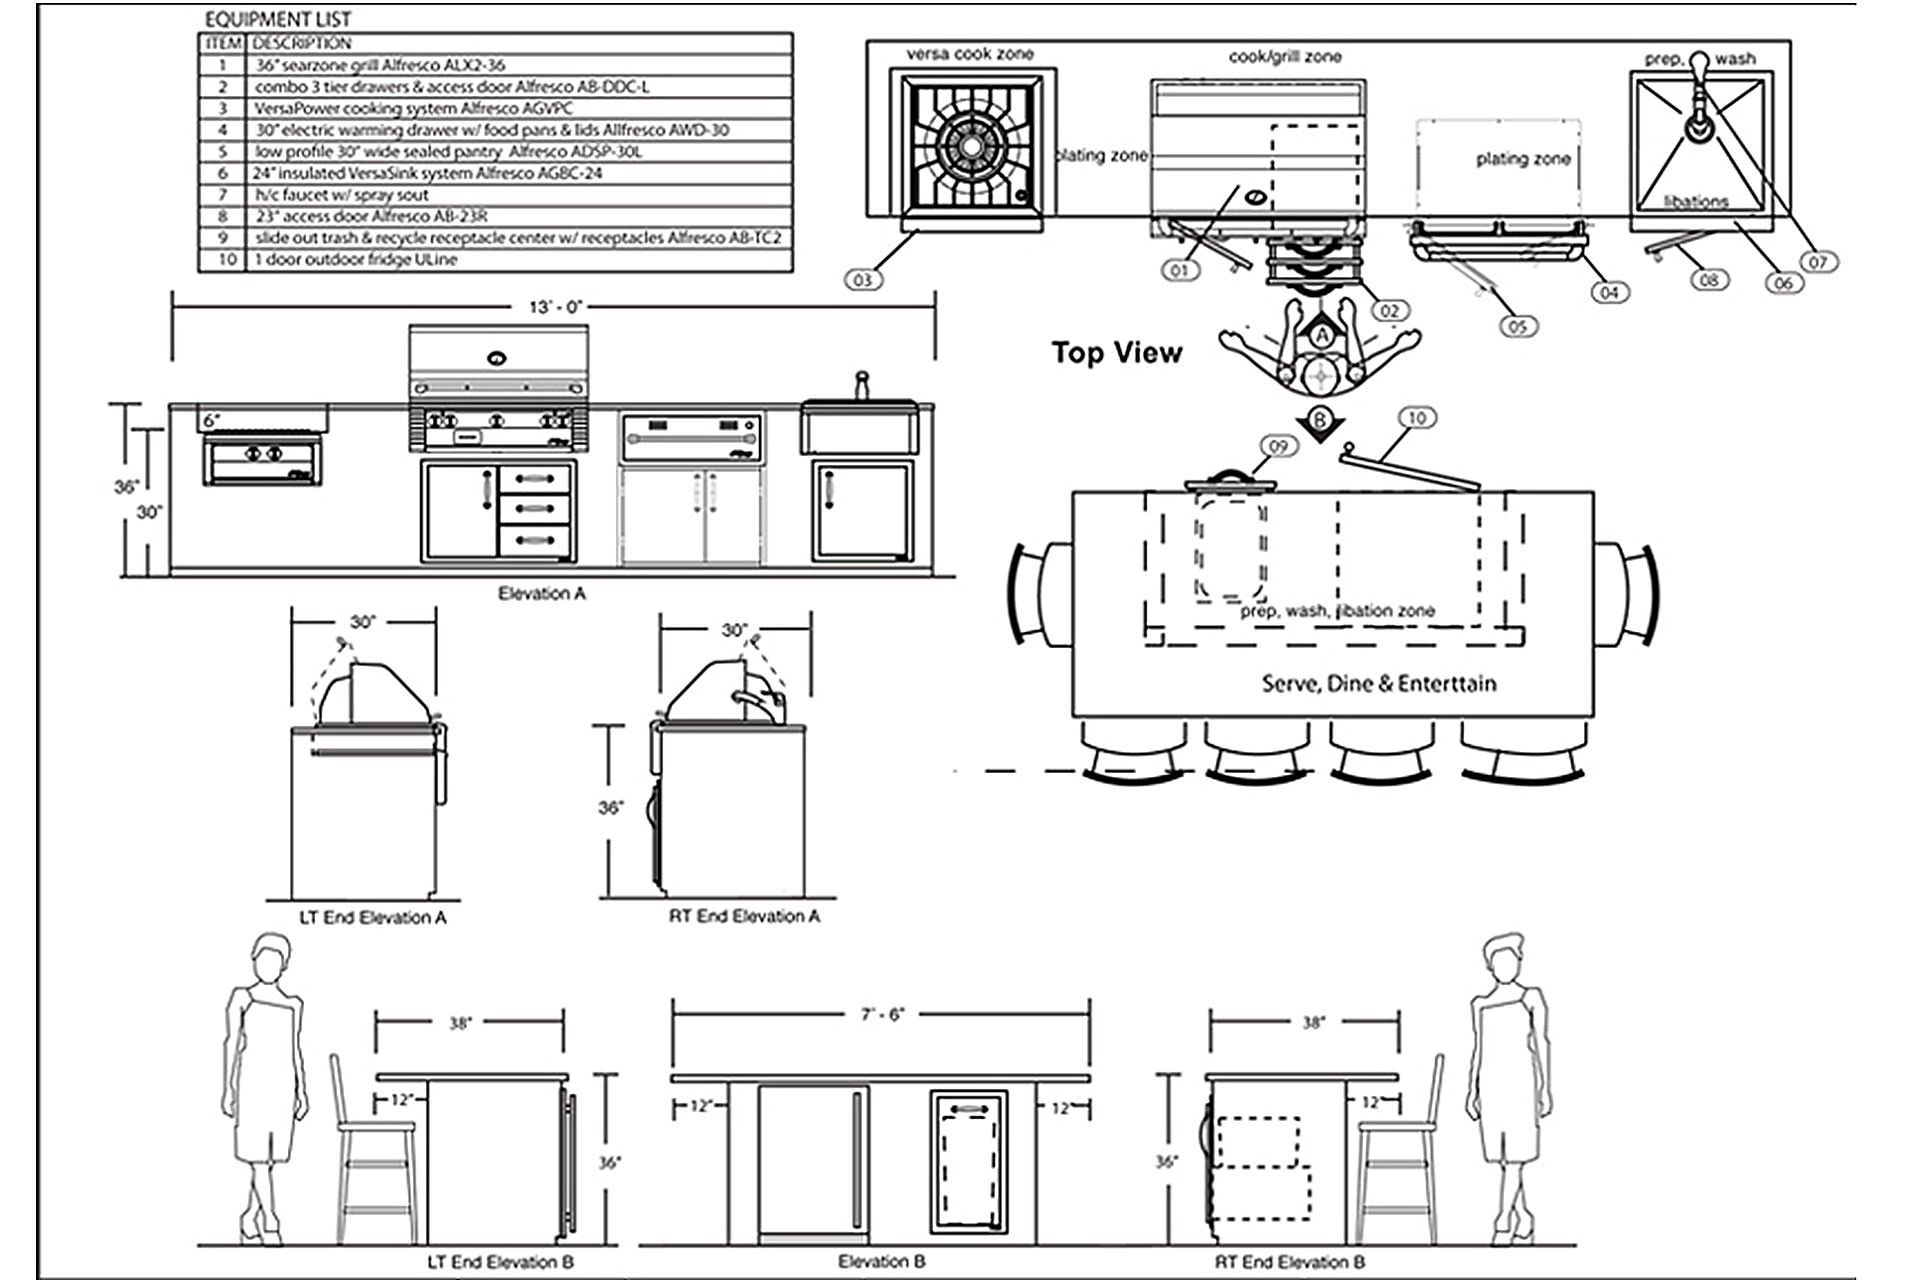 outdoor kitchen design plans free replace sink pdf zitzat kitchens